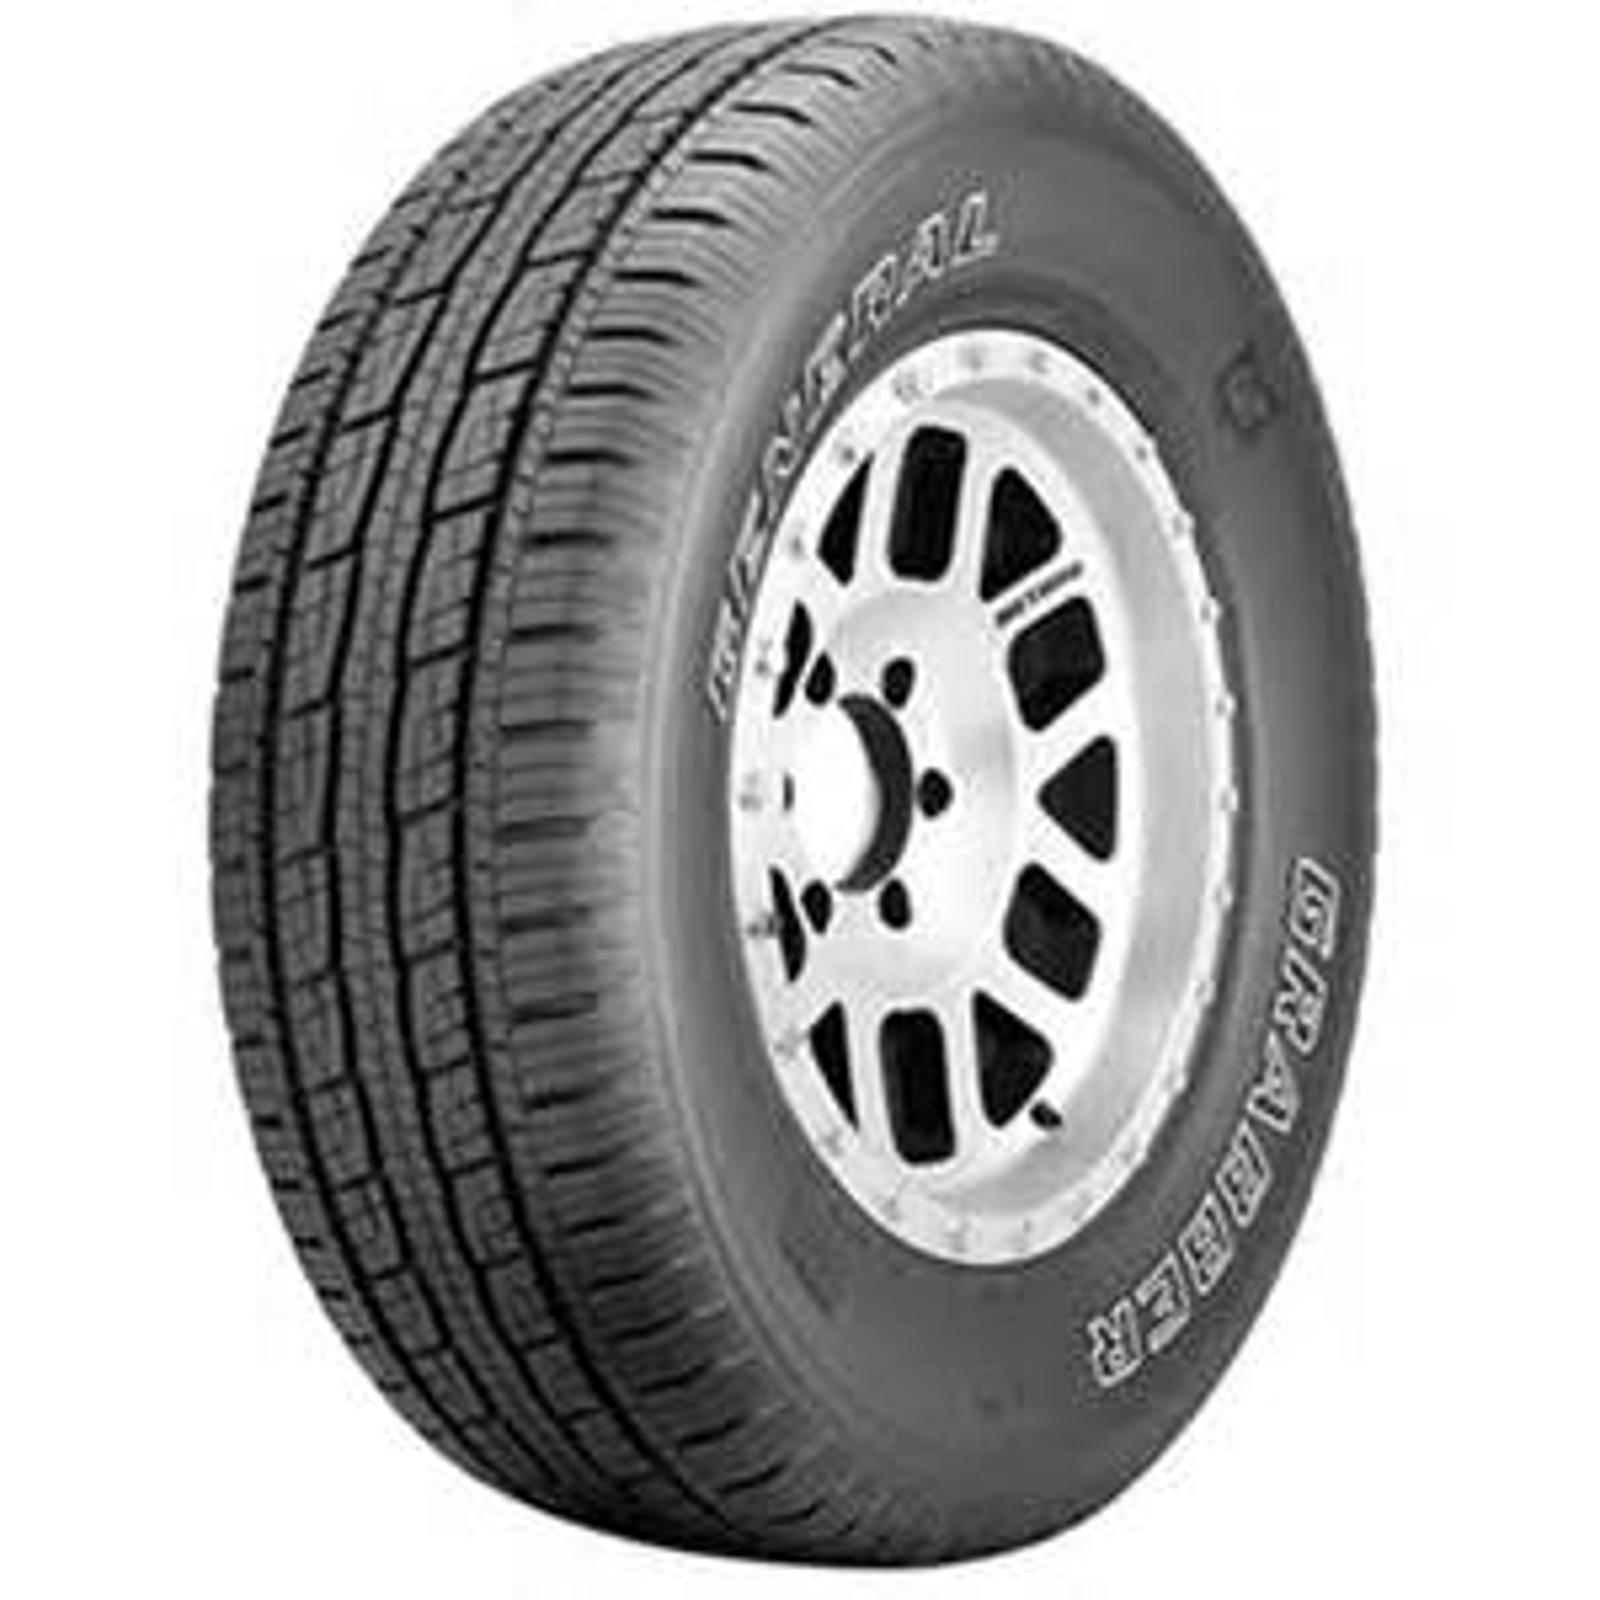 General Tire Grabber HTS60 275/60R20 - All Season Tire